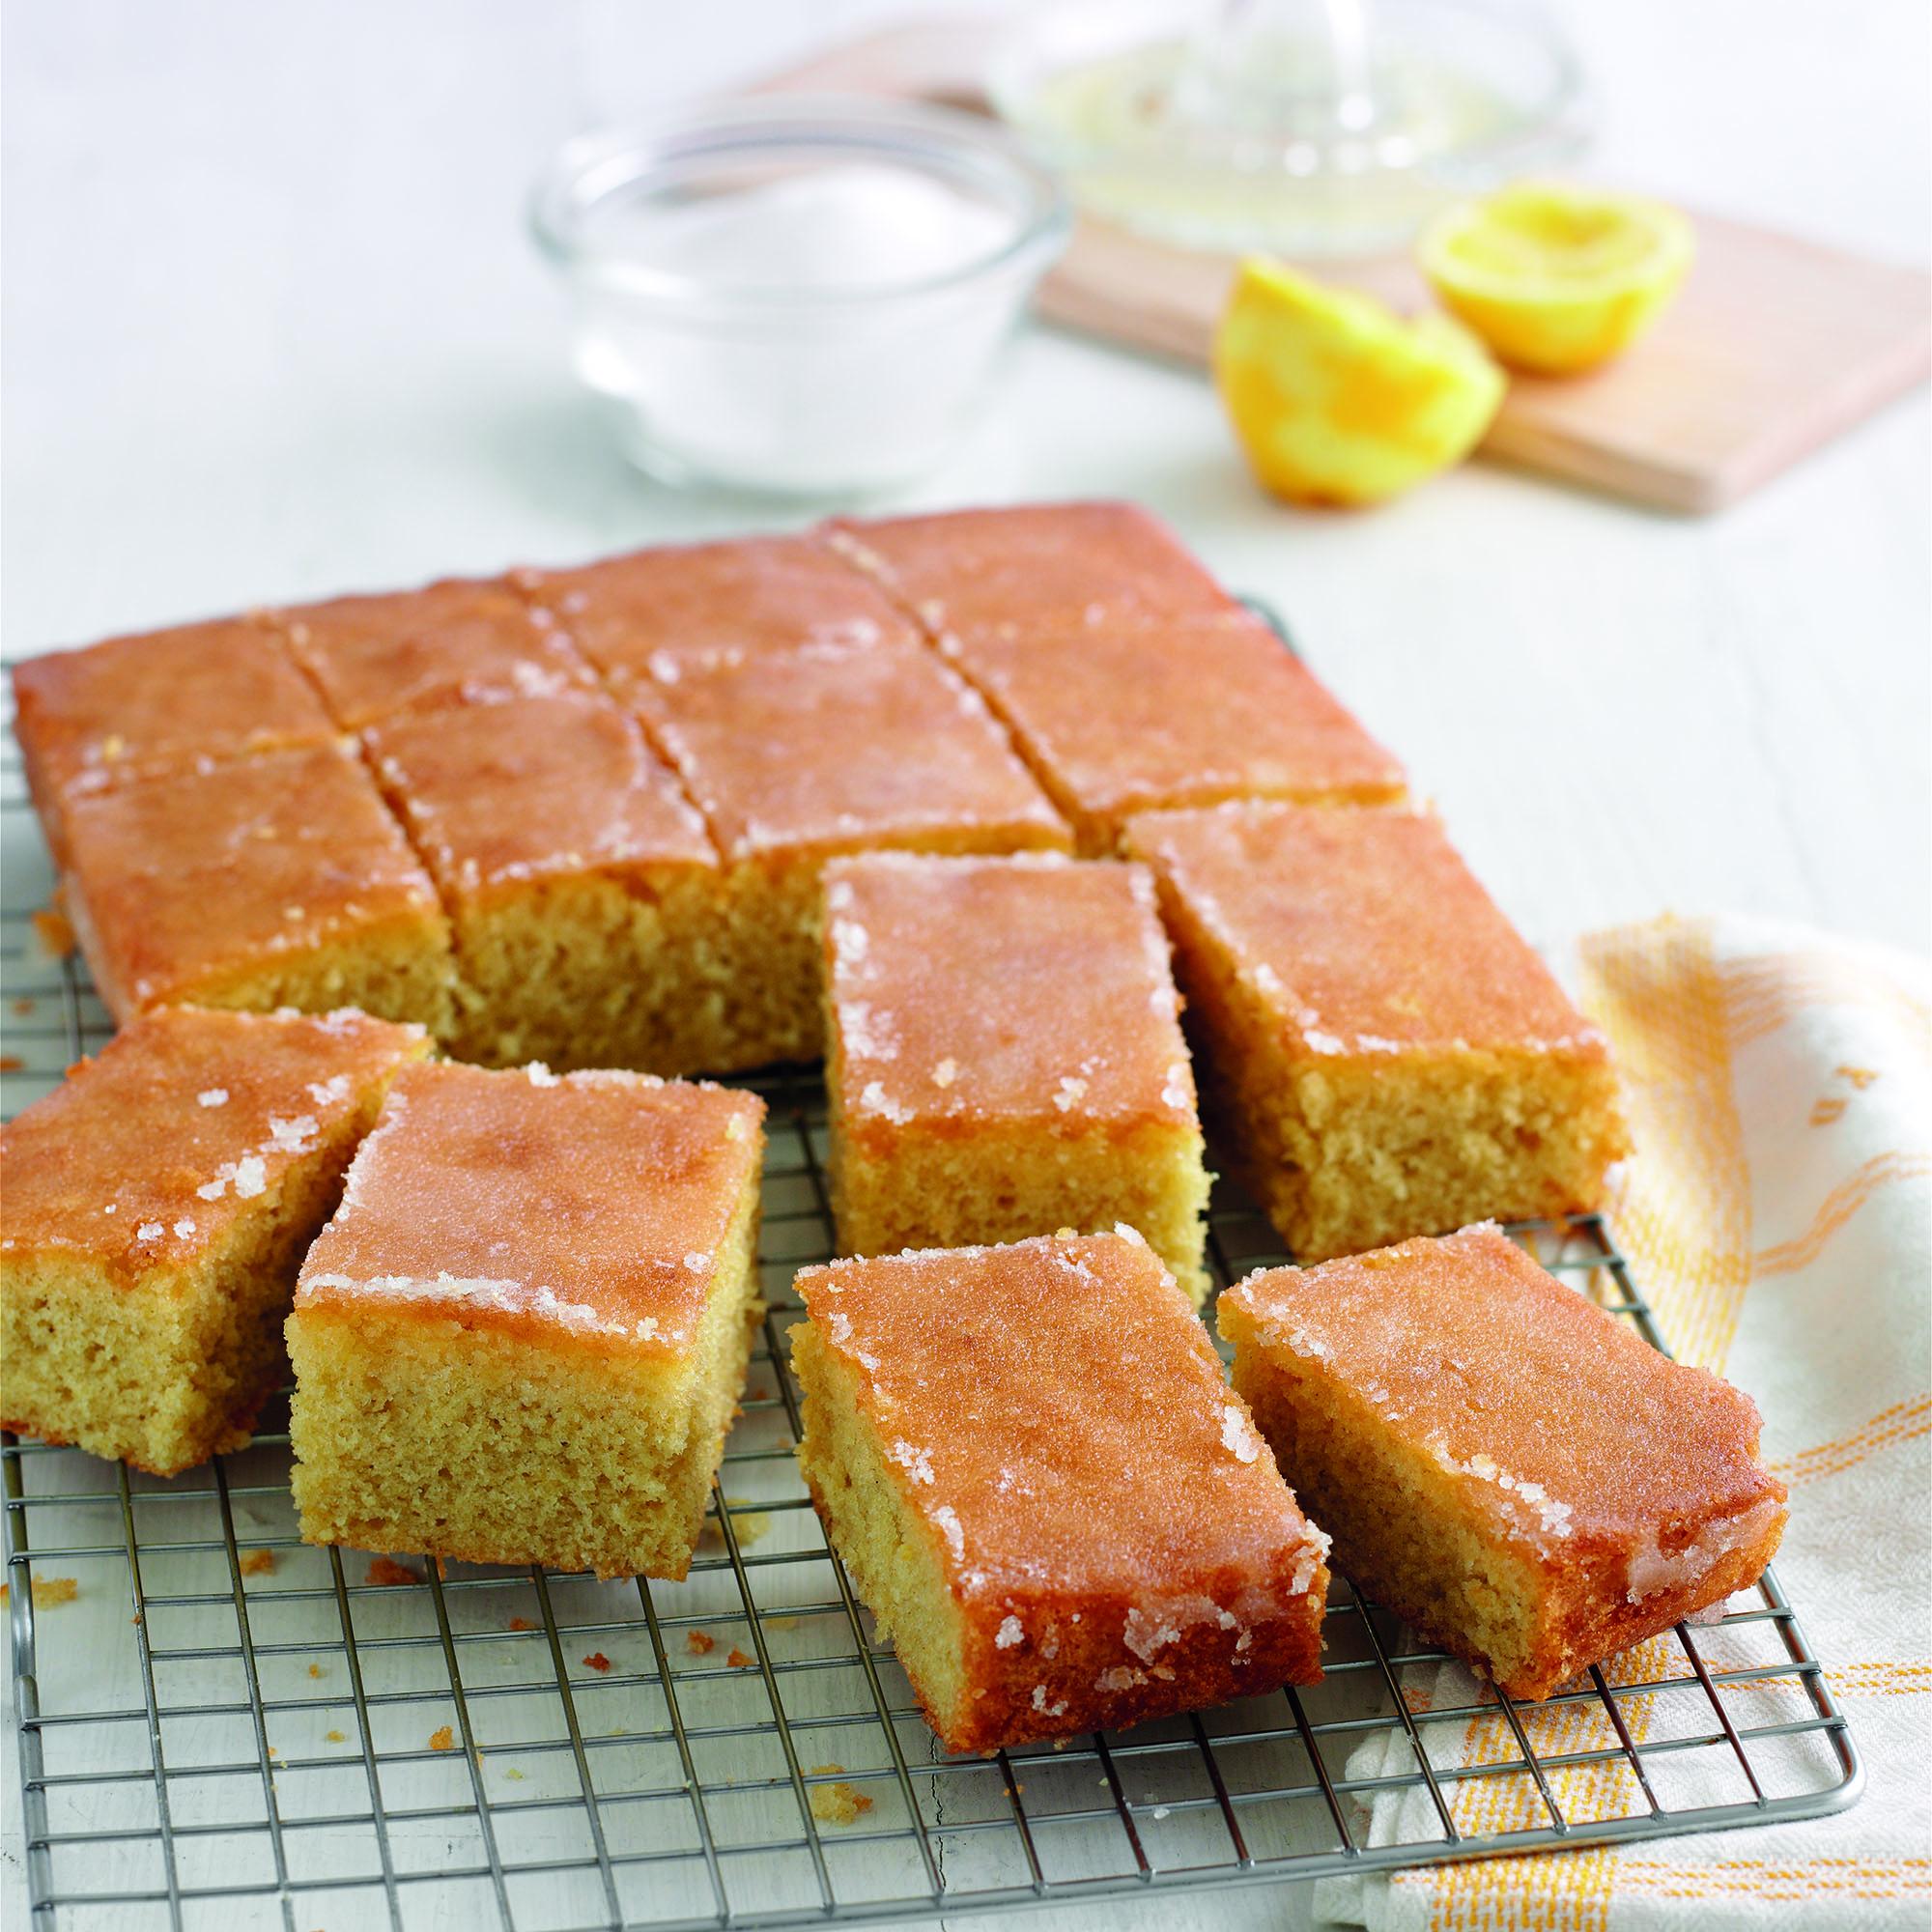 Lemon Sultana Drizzle Cake